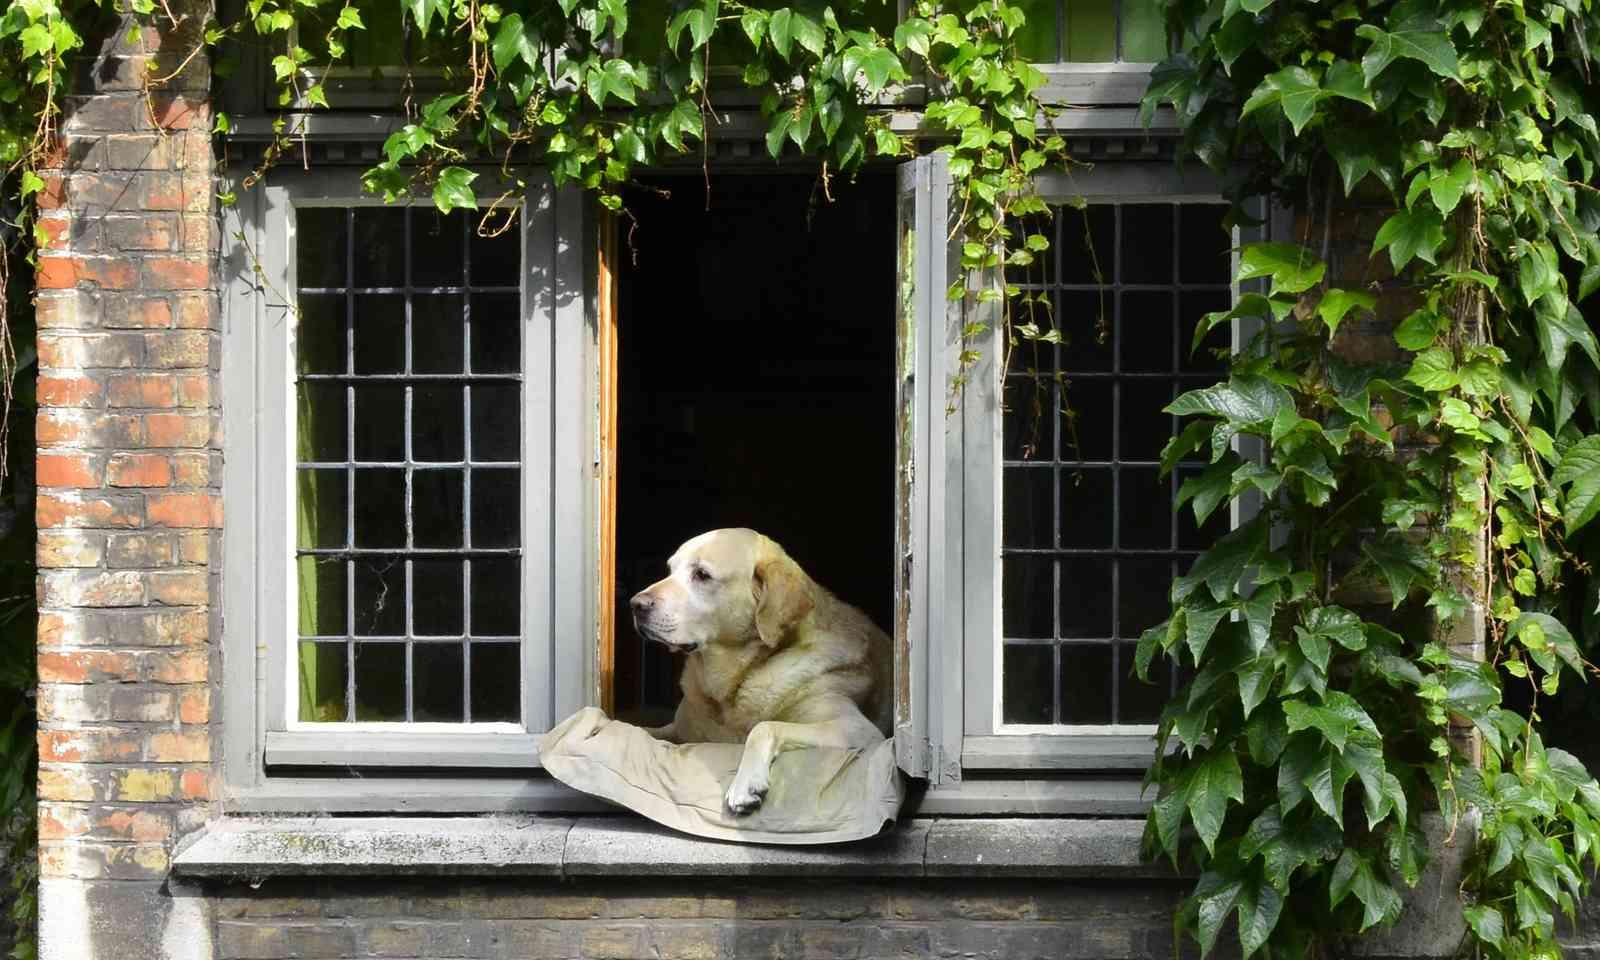 Fidel relaxing in window in Bruges (Dreamstime)